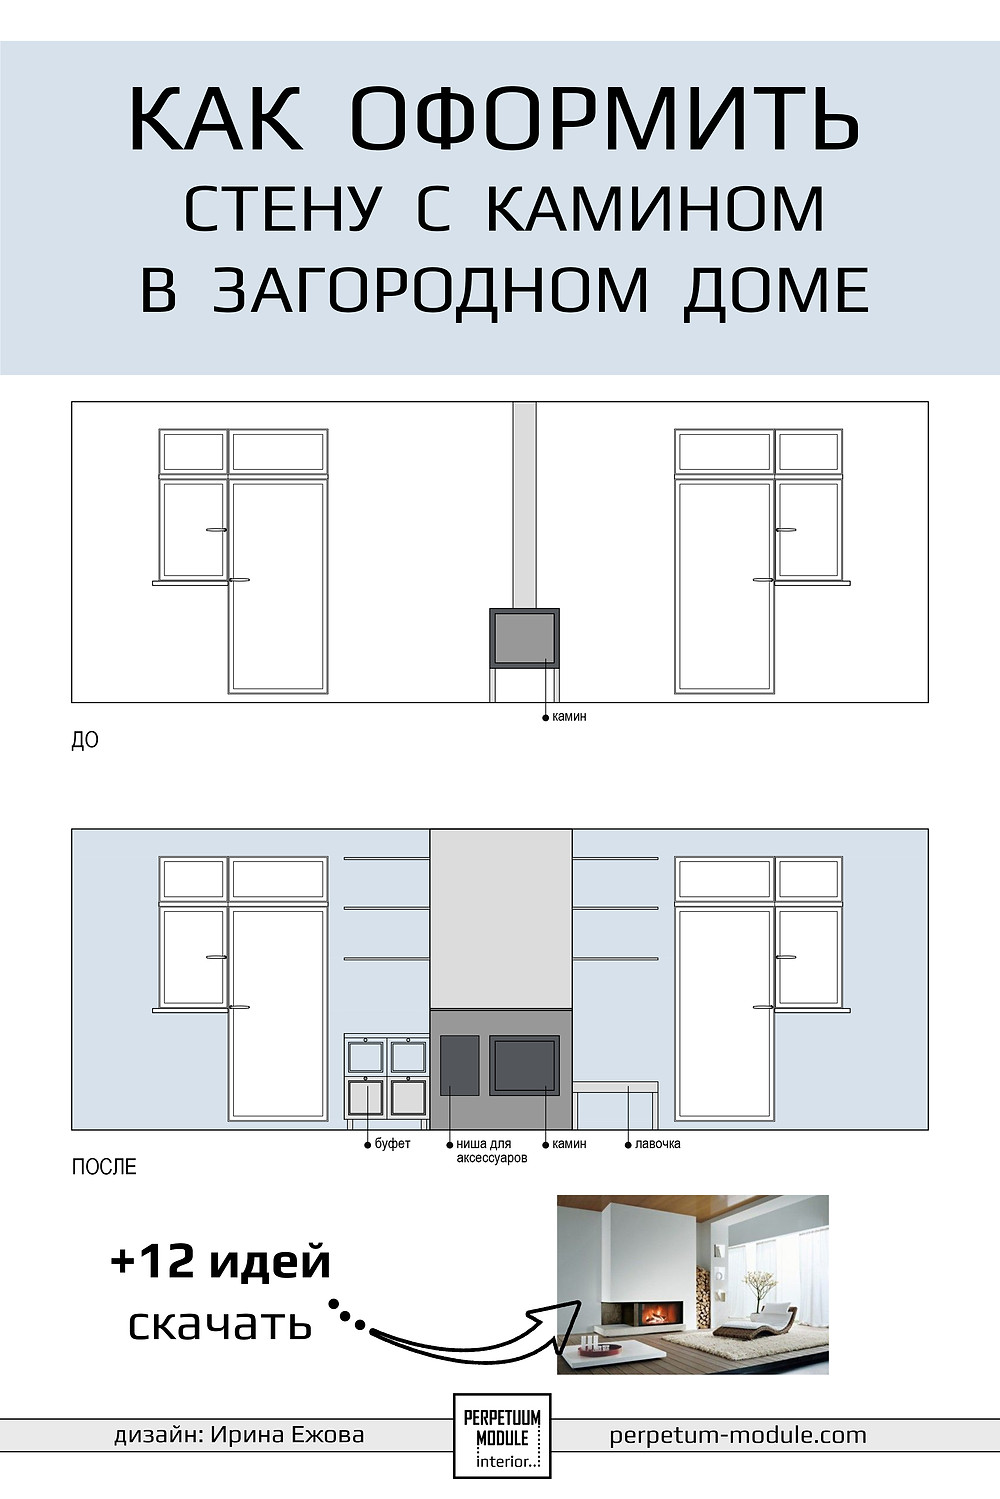 perpetuum-module-kak-oformit'-kamin-v-zagorodnom-dome-00